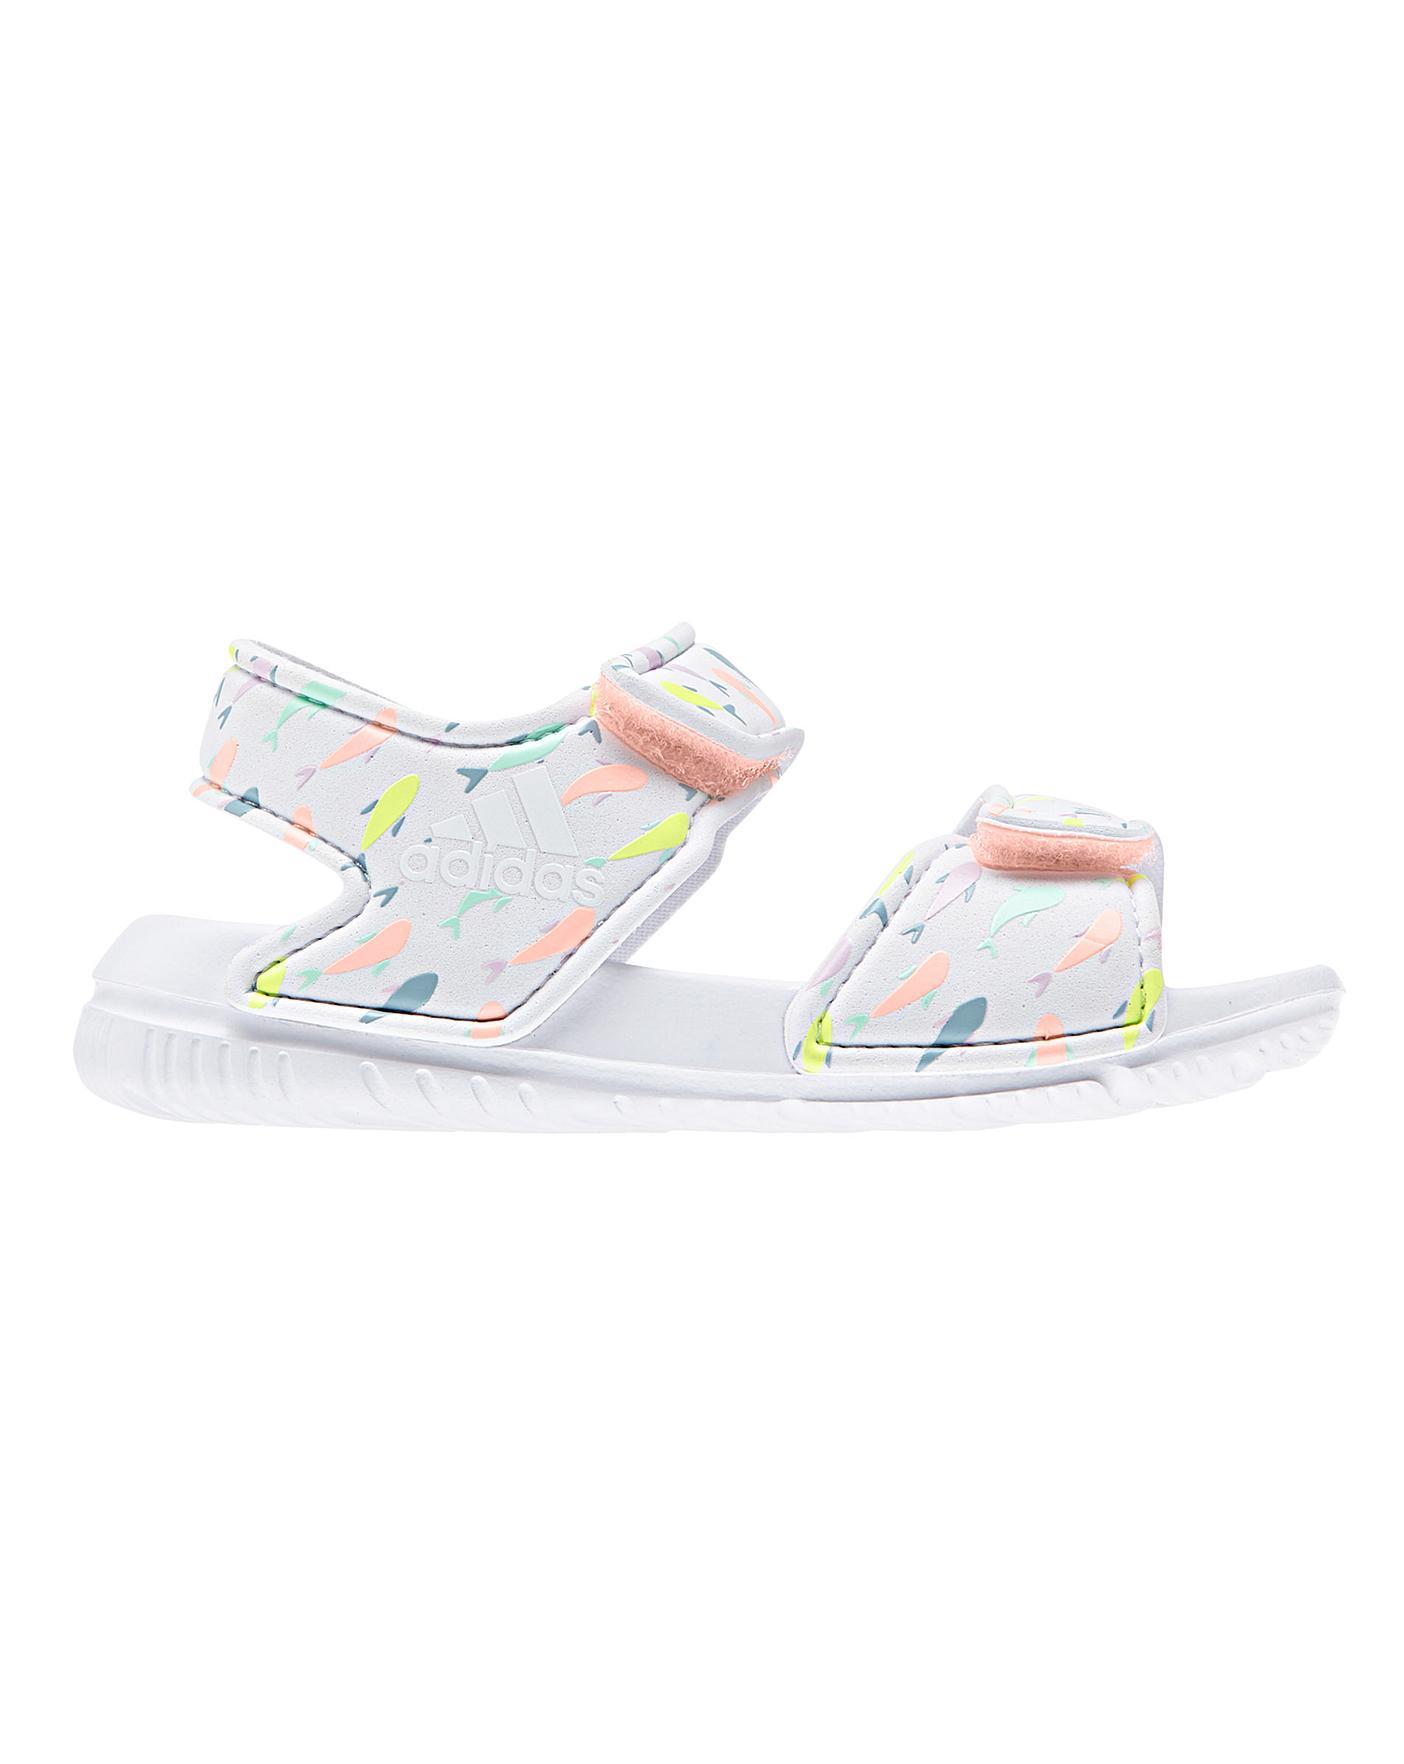 adidas Altaswim Infants Sandals